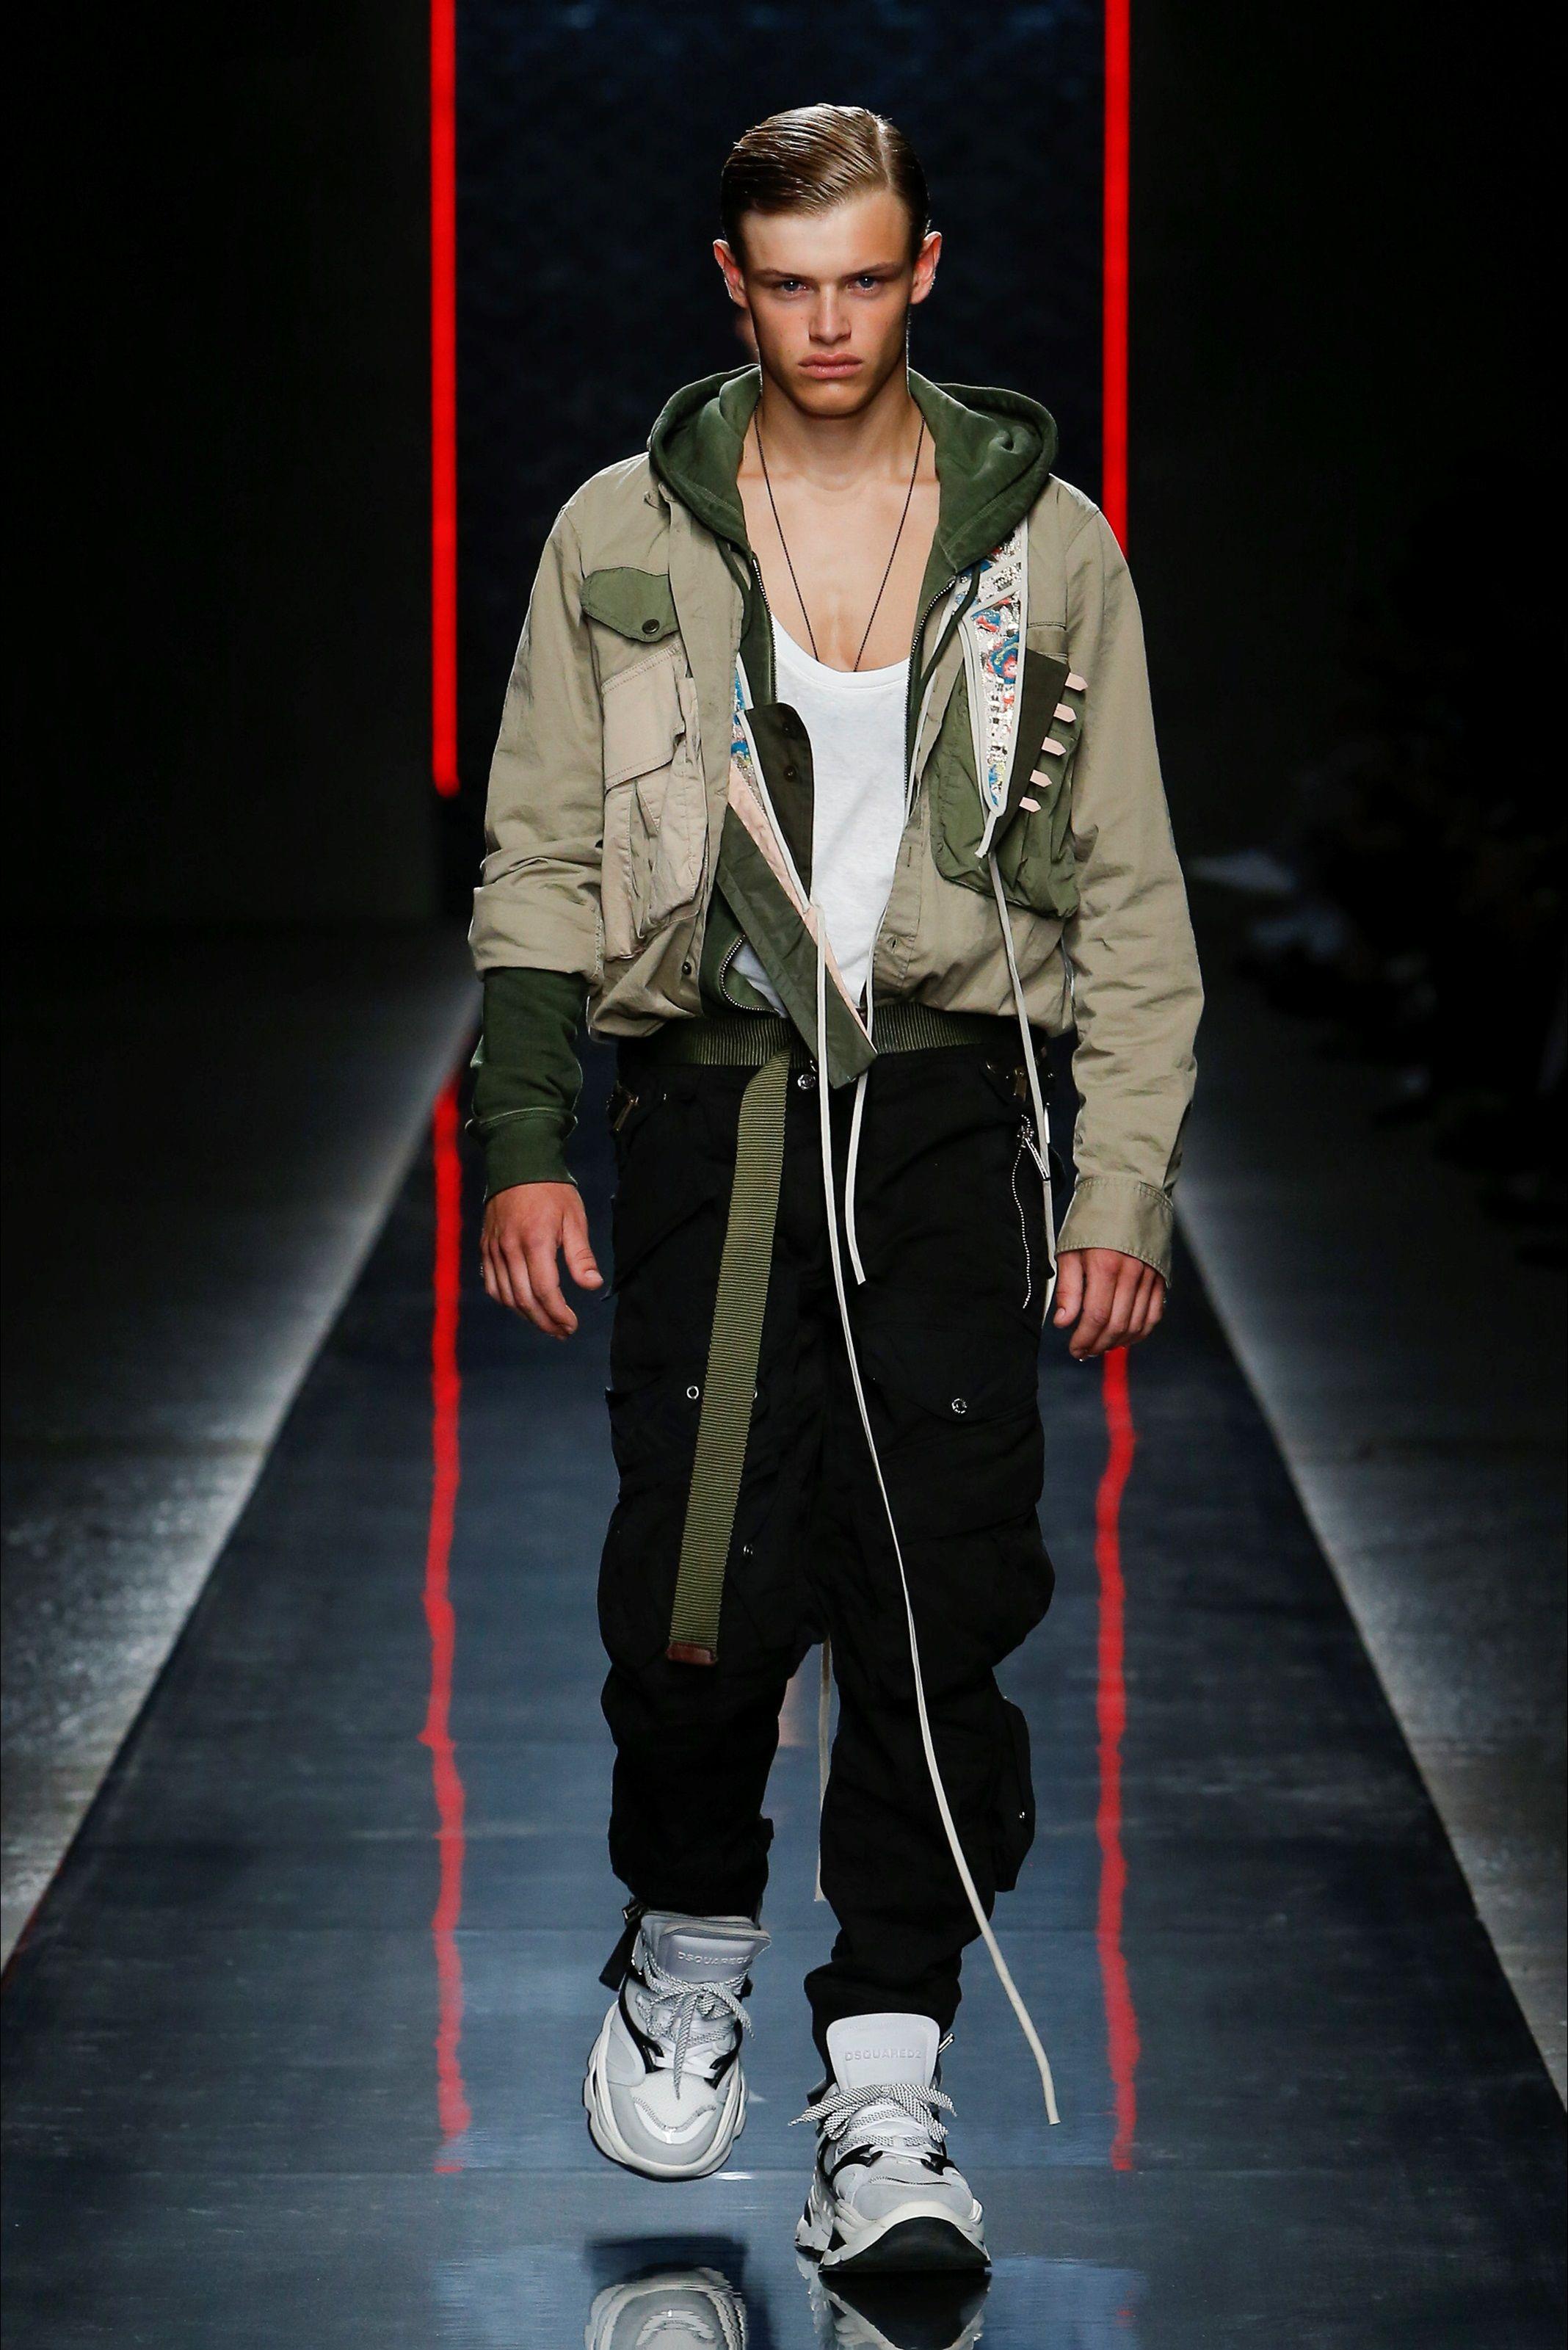 401c80fca89c Sfilata Moda Uomo DSquared2 Milano - Primavera Estate 2019 - Vogue ...